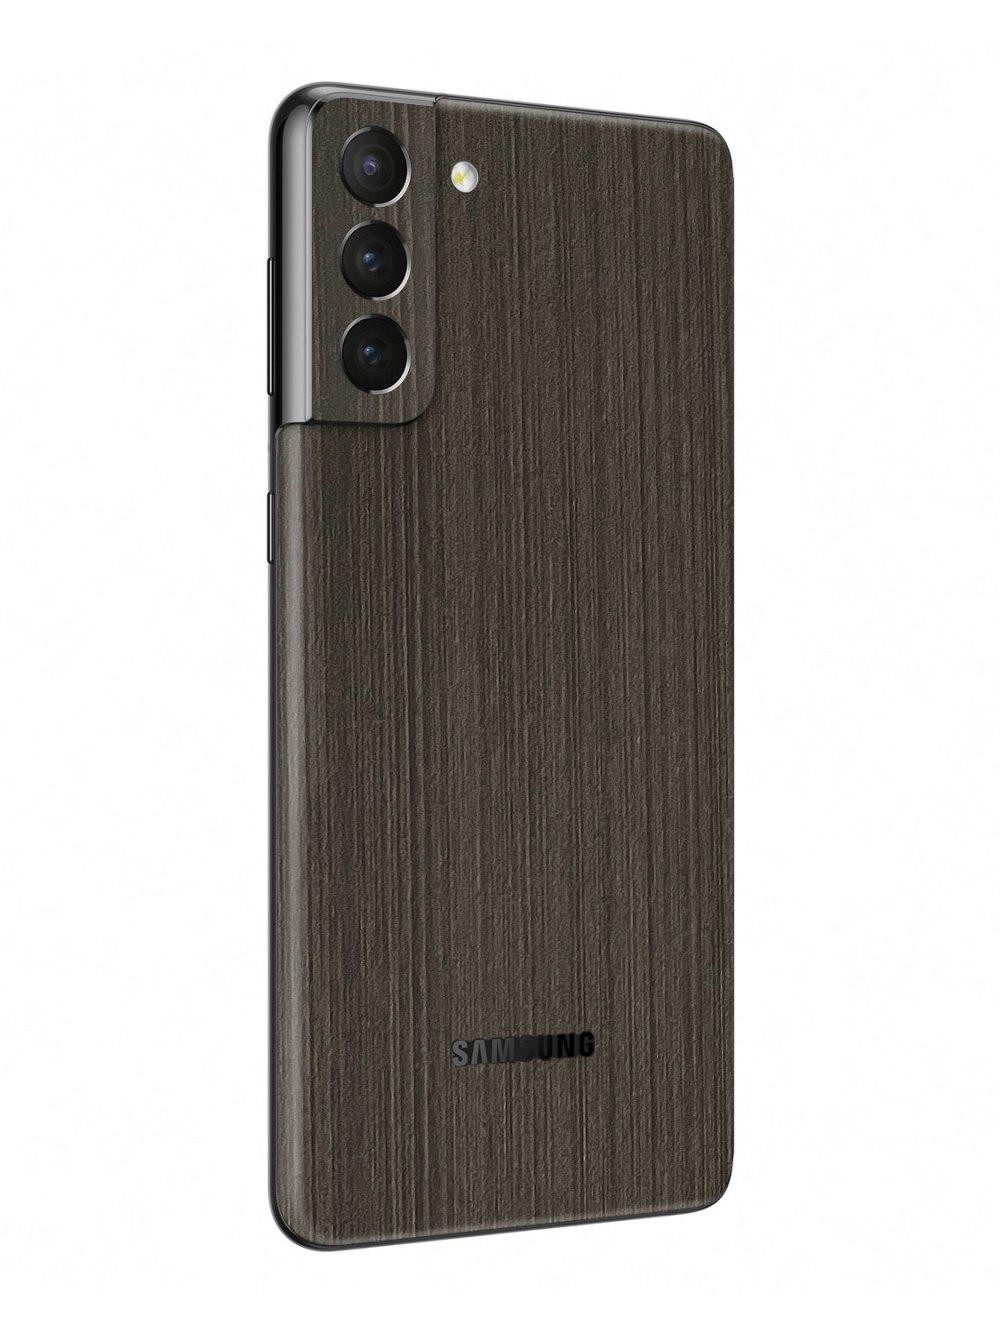 Brushed Dark Bronze Metallic skin for Samsung Galaxy S21